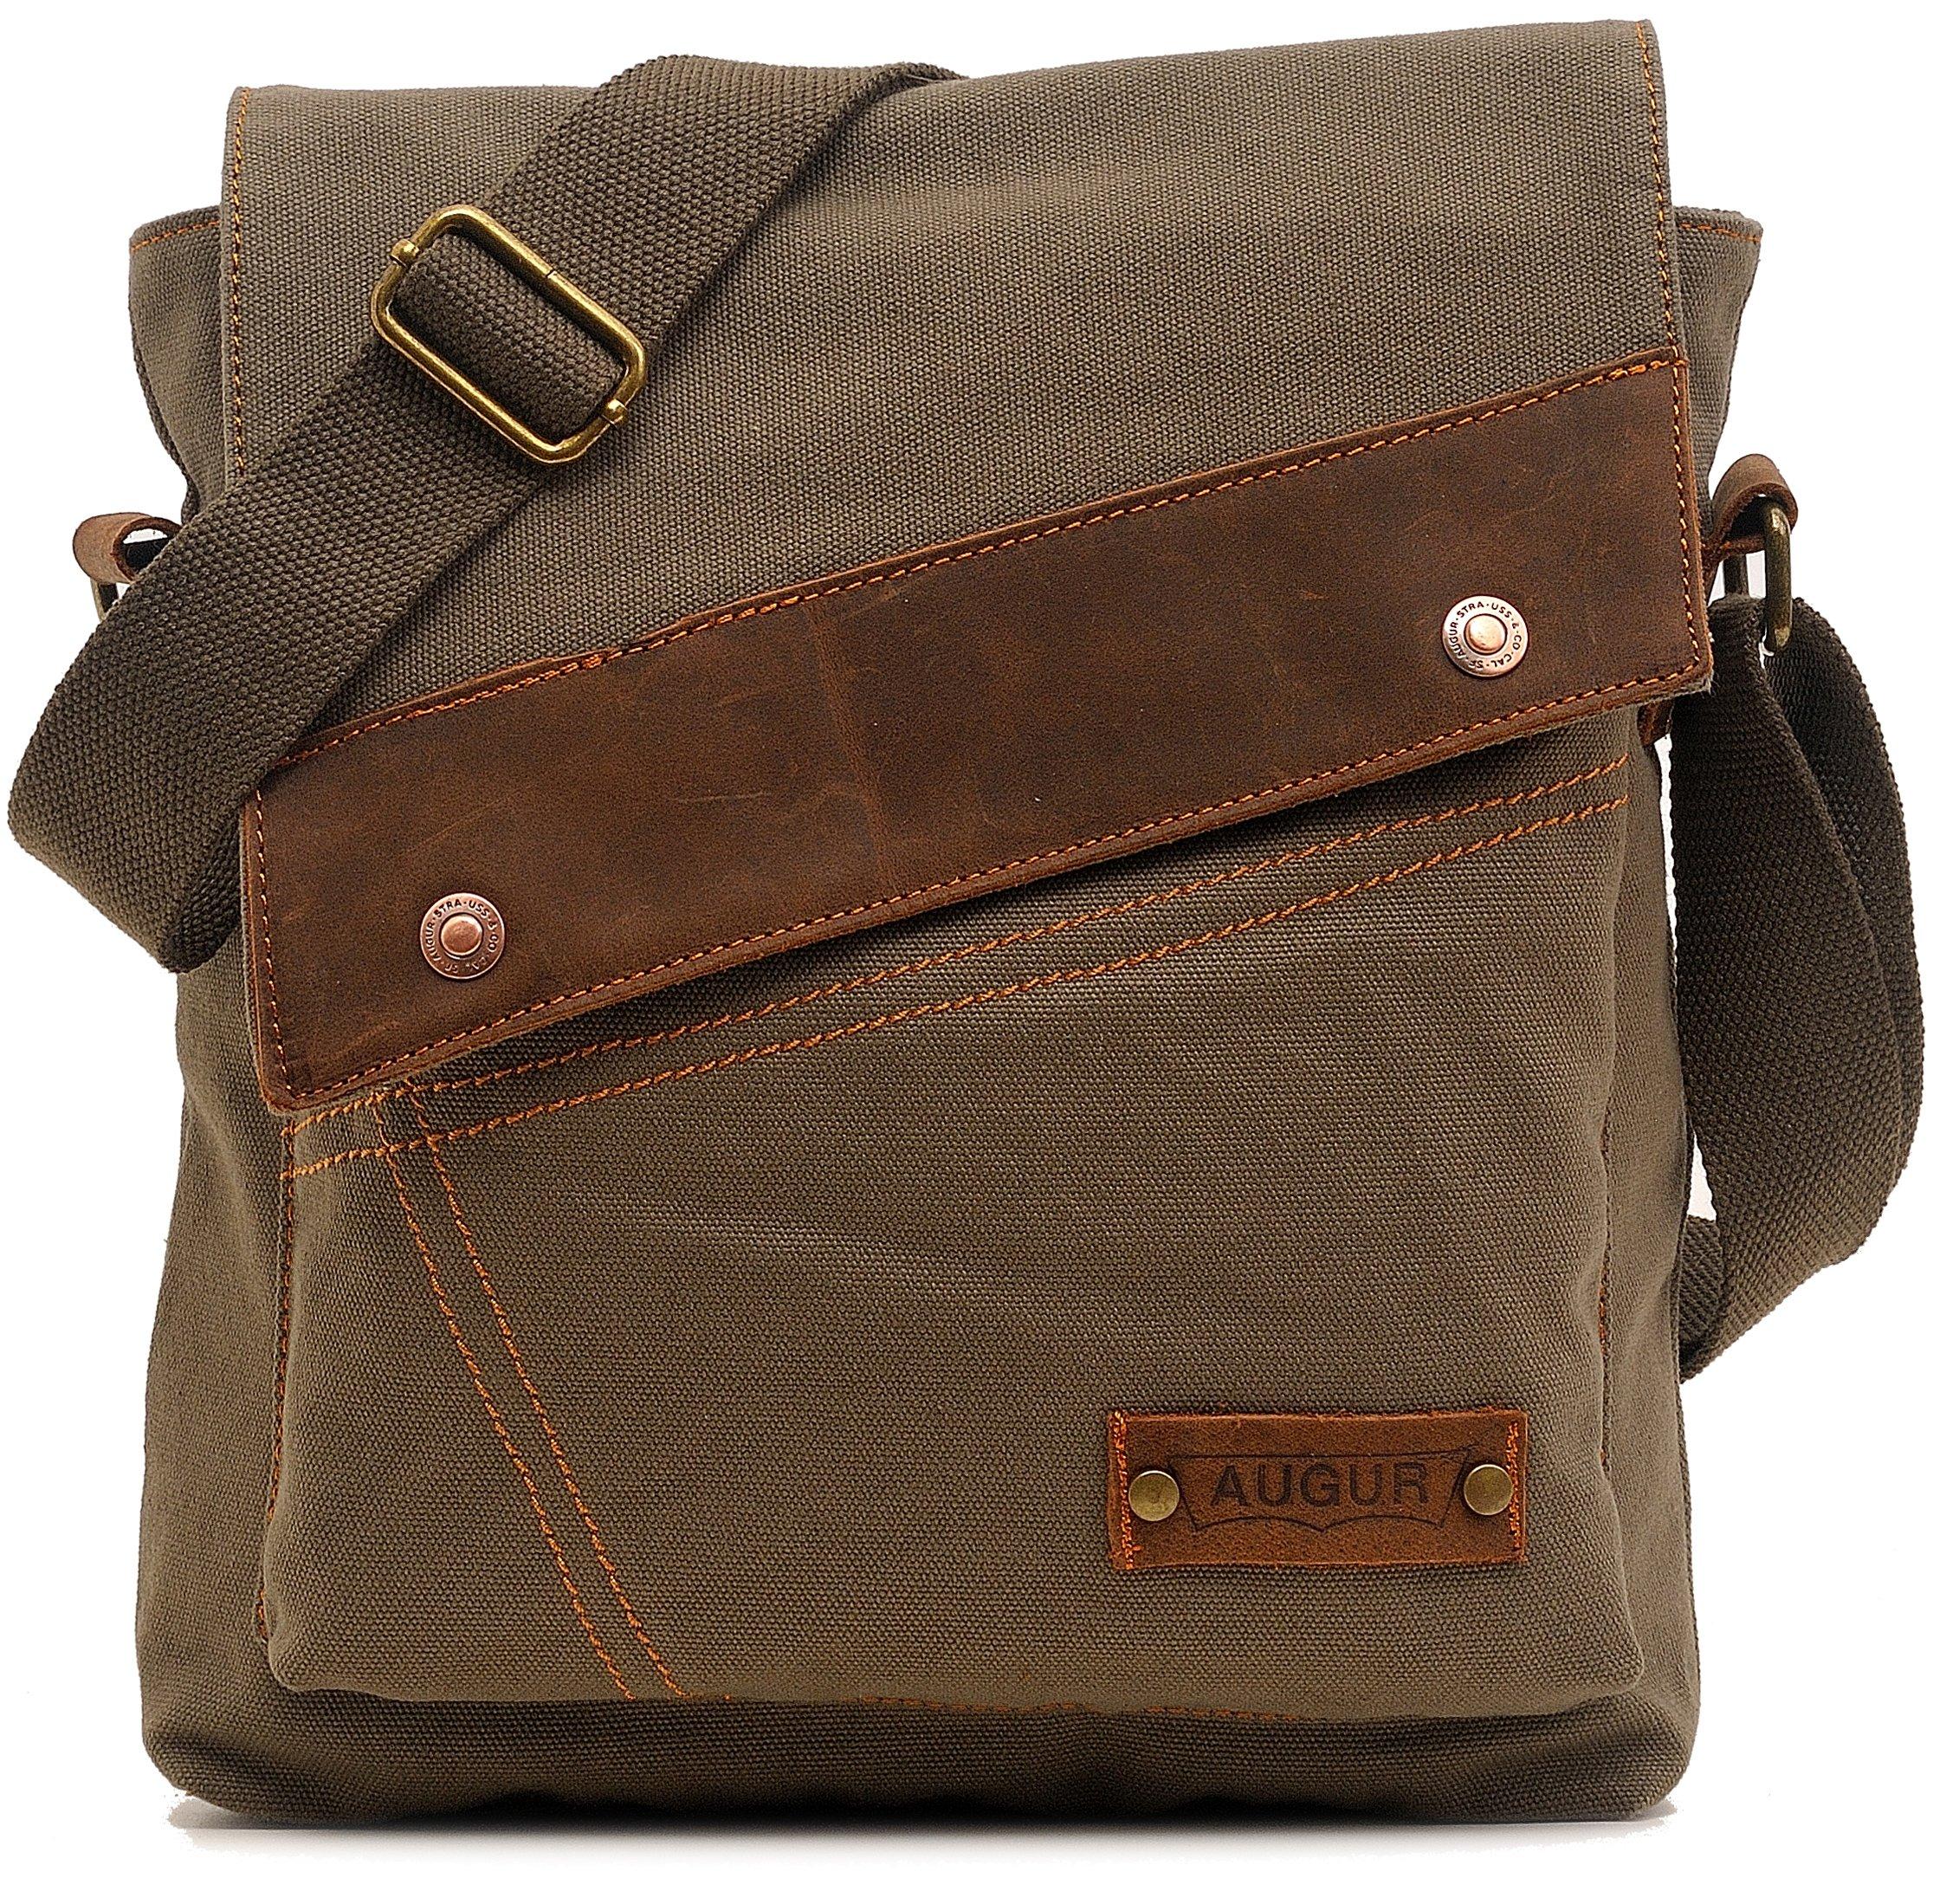 Magictodoor Small Vintage Canvas Messenger Bag Ipad Shoulder Bag Travel Portfolio Bag